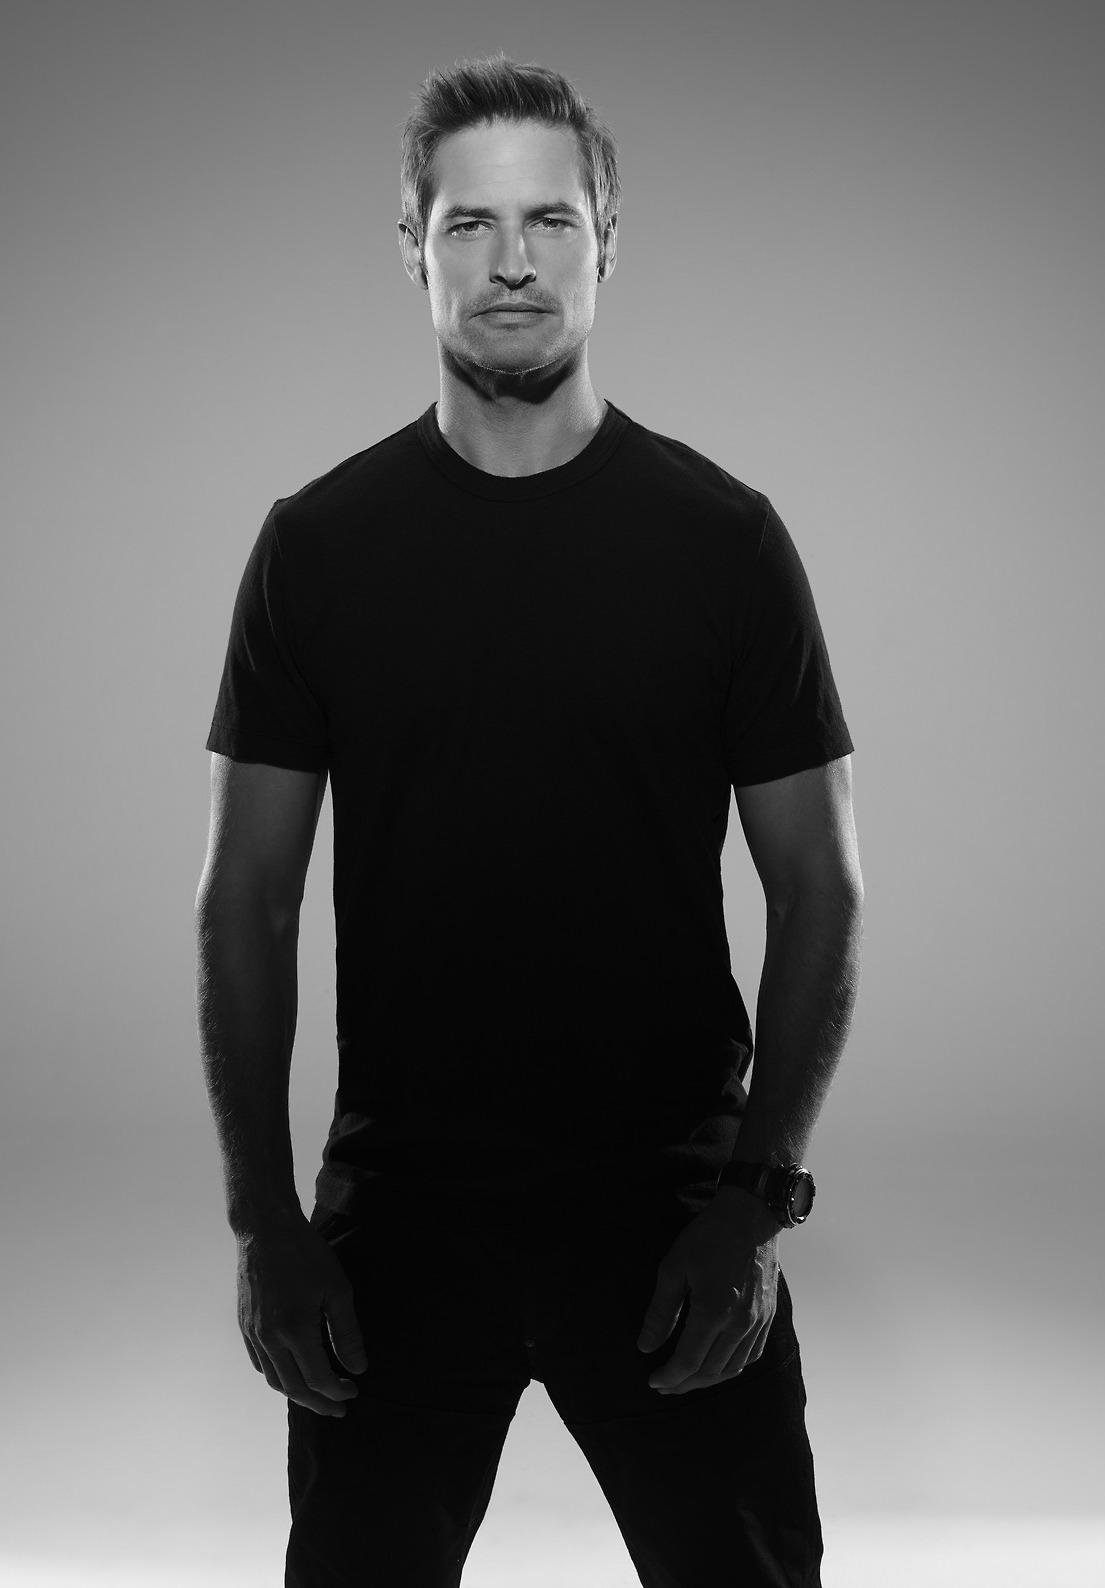 Josh-Holloway-PROMOTIONAL-PHOTOSHOOT-INTELLIGENCE-2014-josh-holloway-36445449-1280-1708.jpg